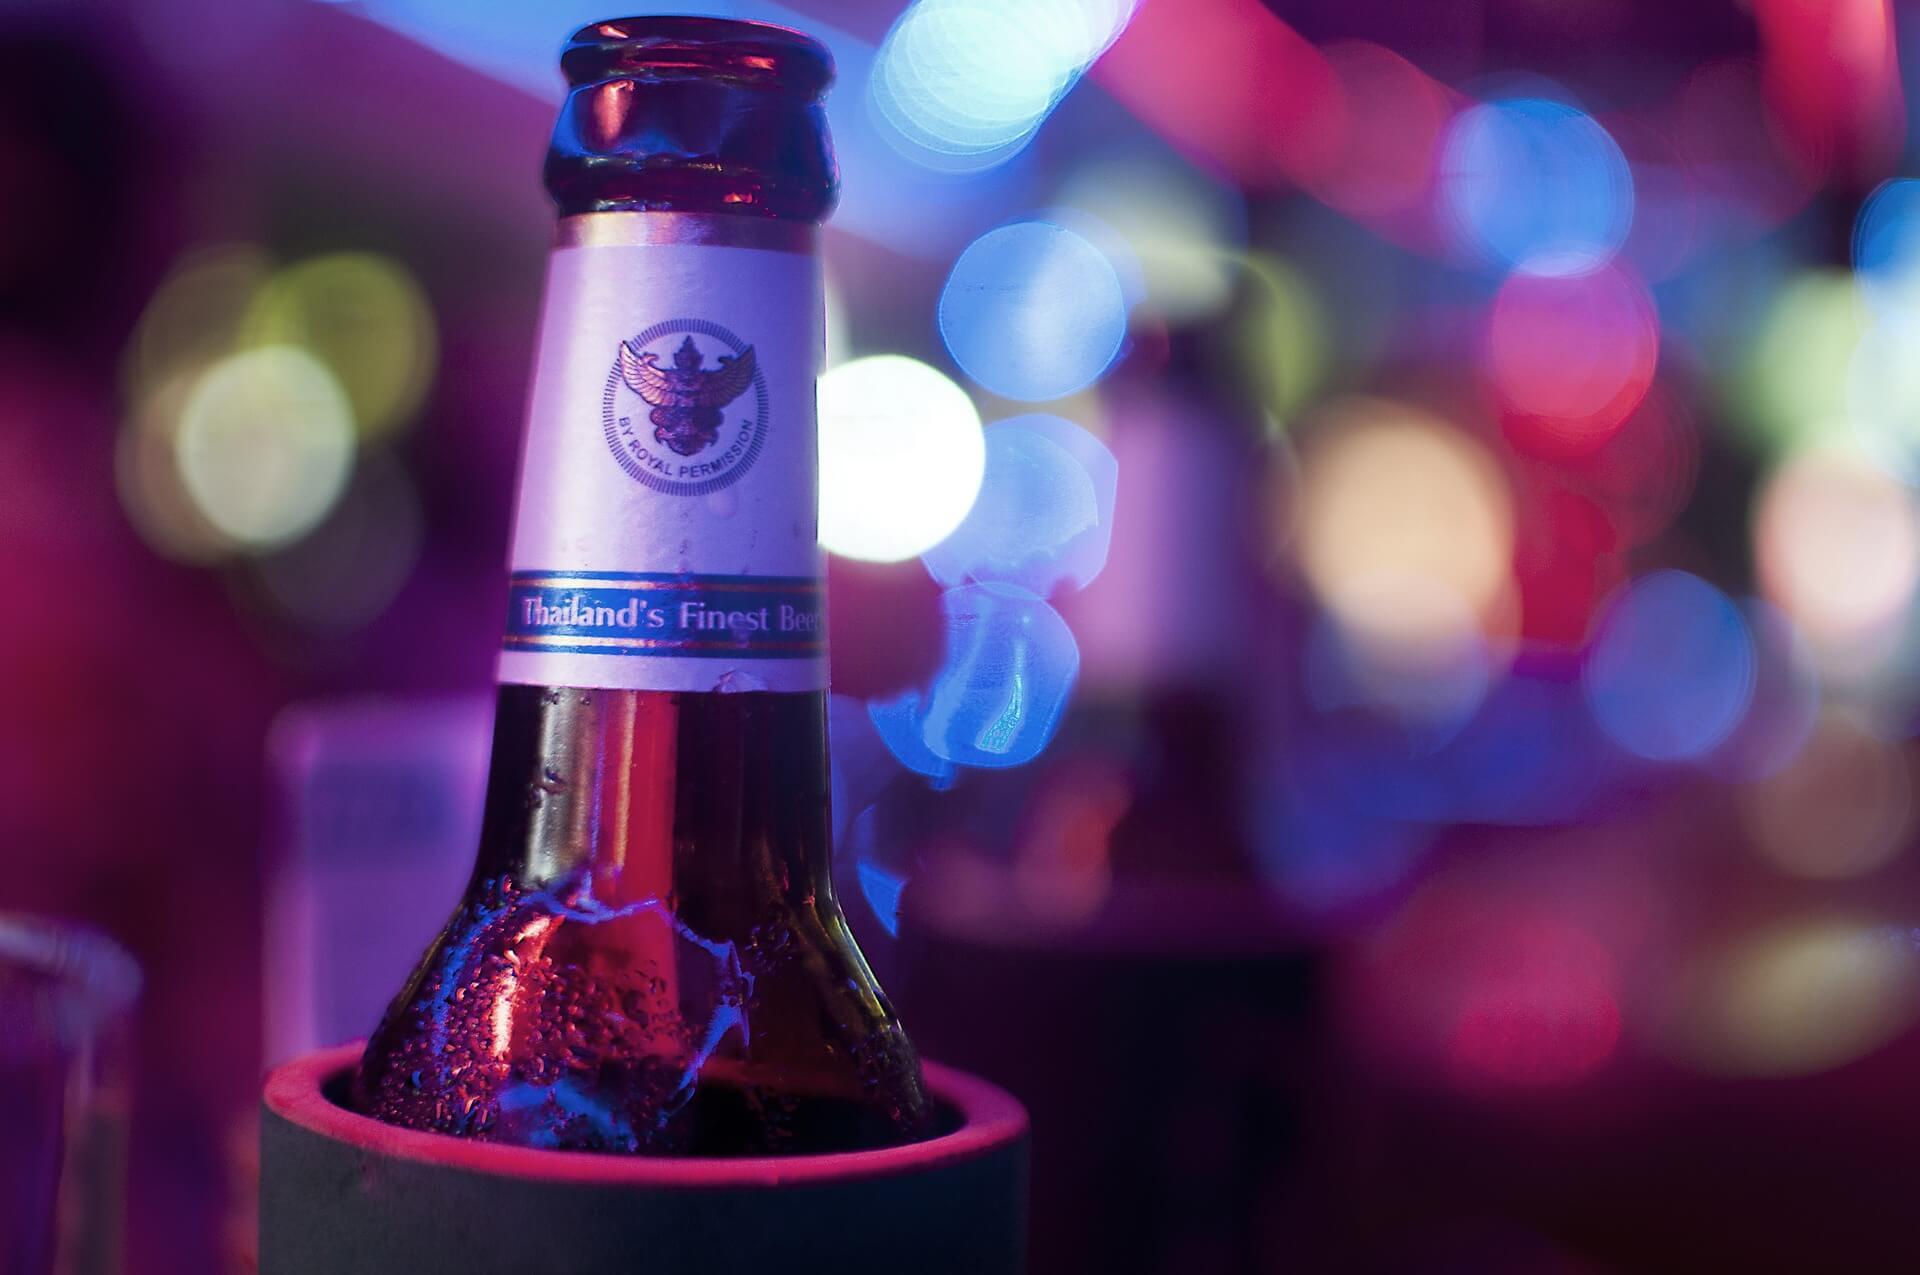 Pai nightclubs and bars